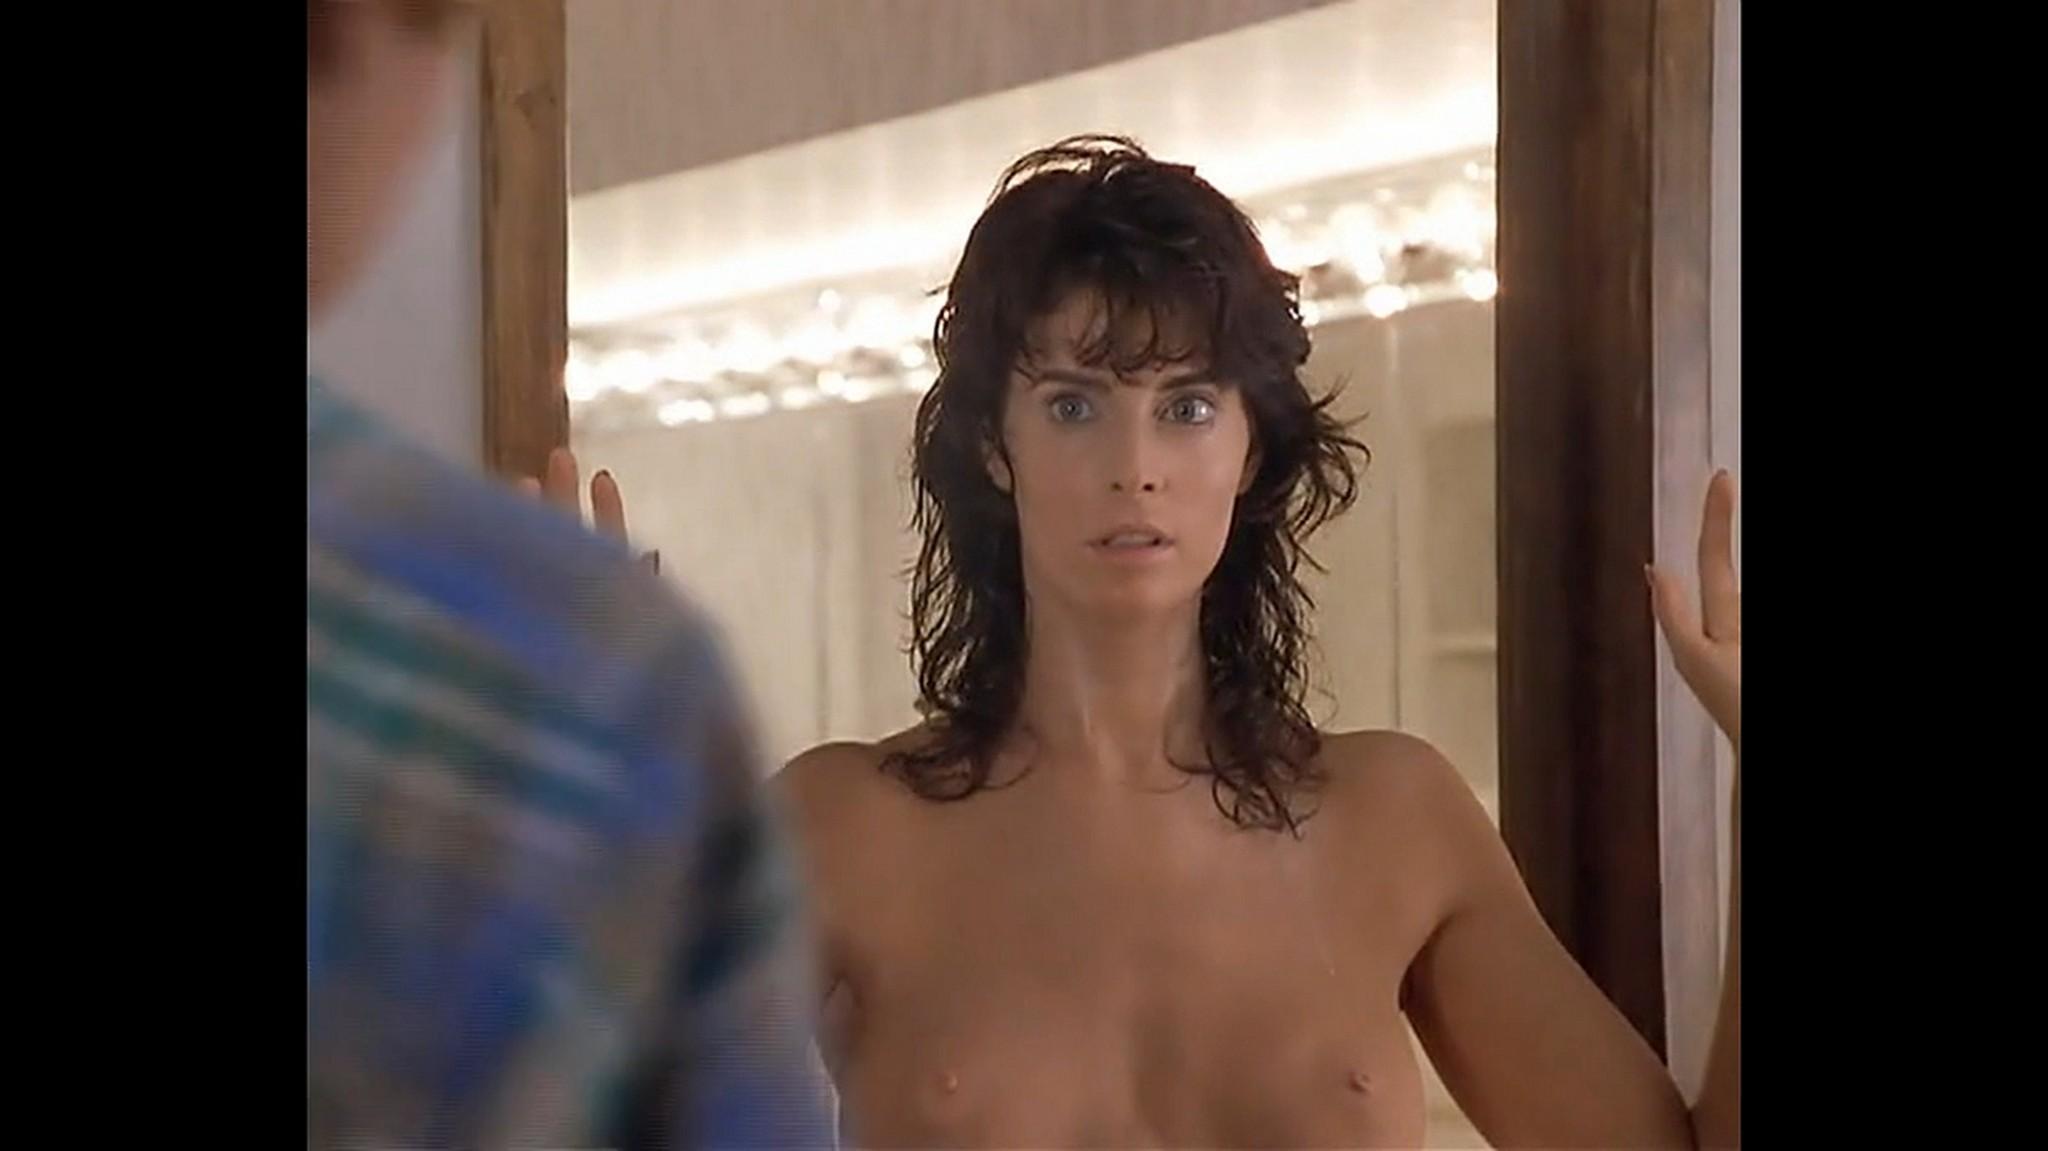 Joan Severance nude topless - See No Evil Hear No Evil (1989) HD 720/1080p (13)